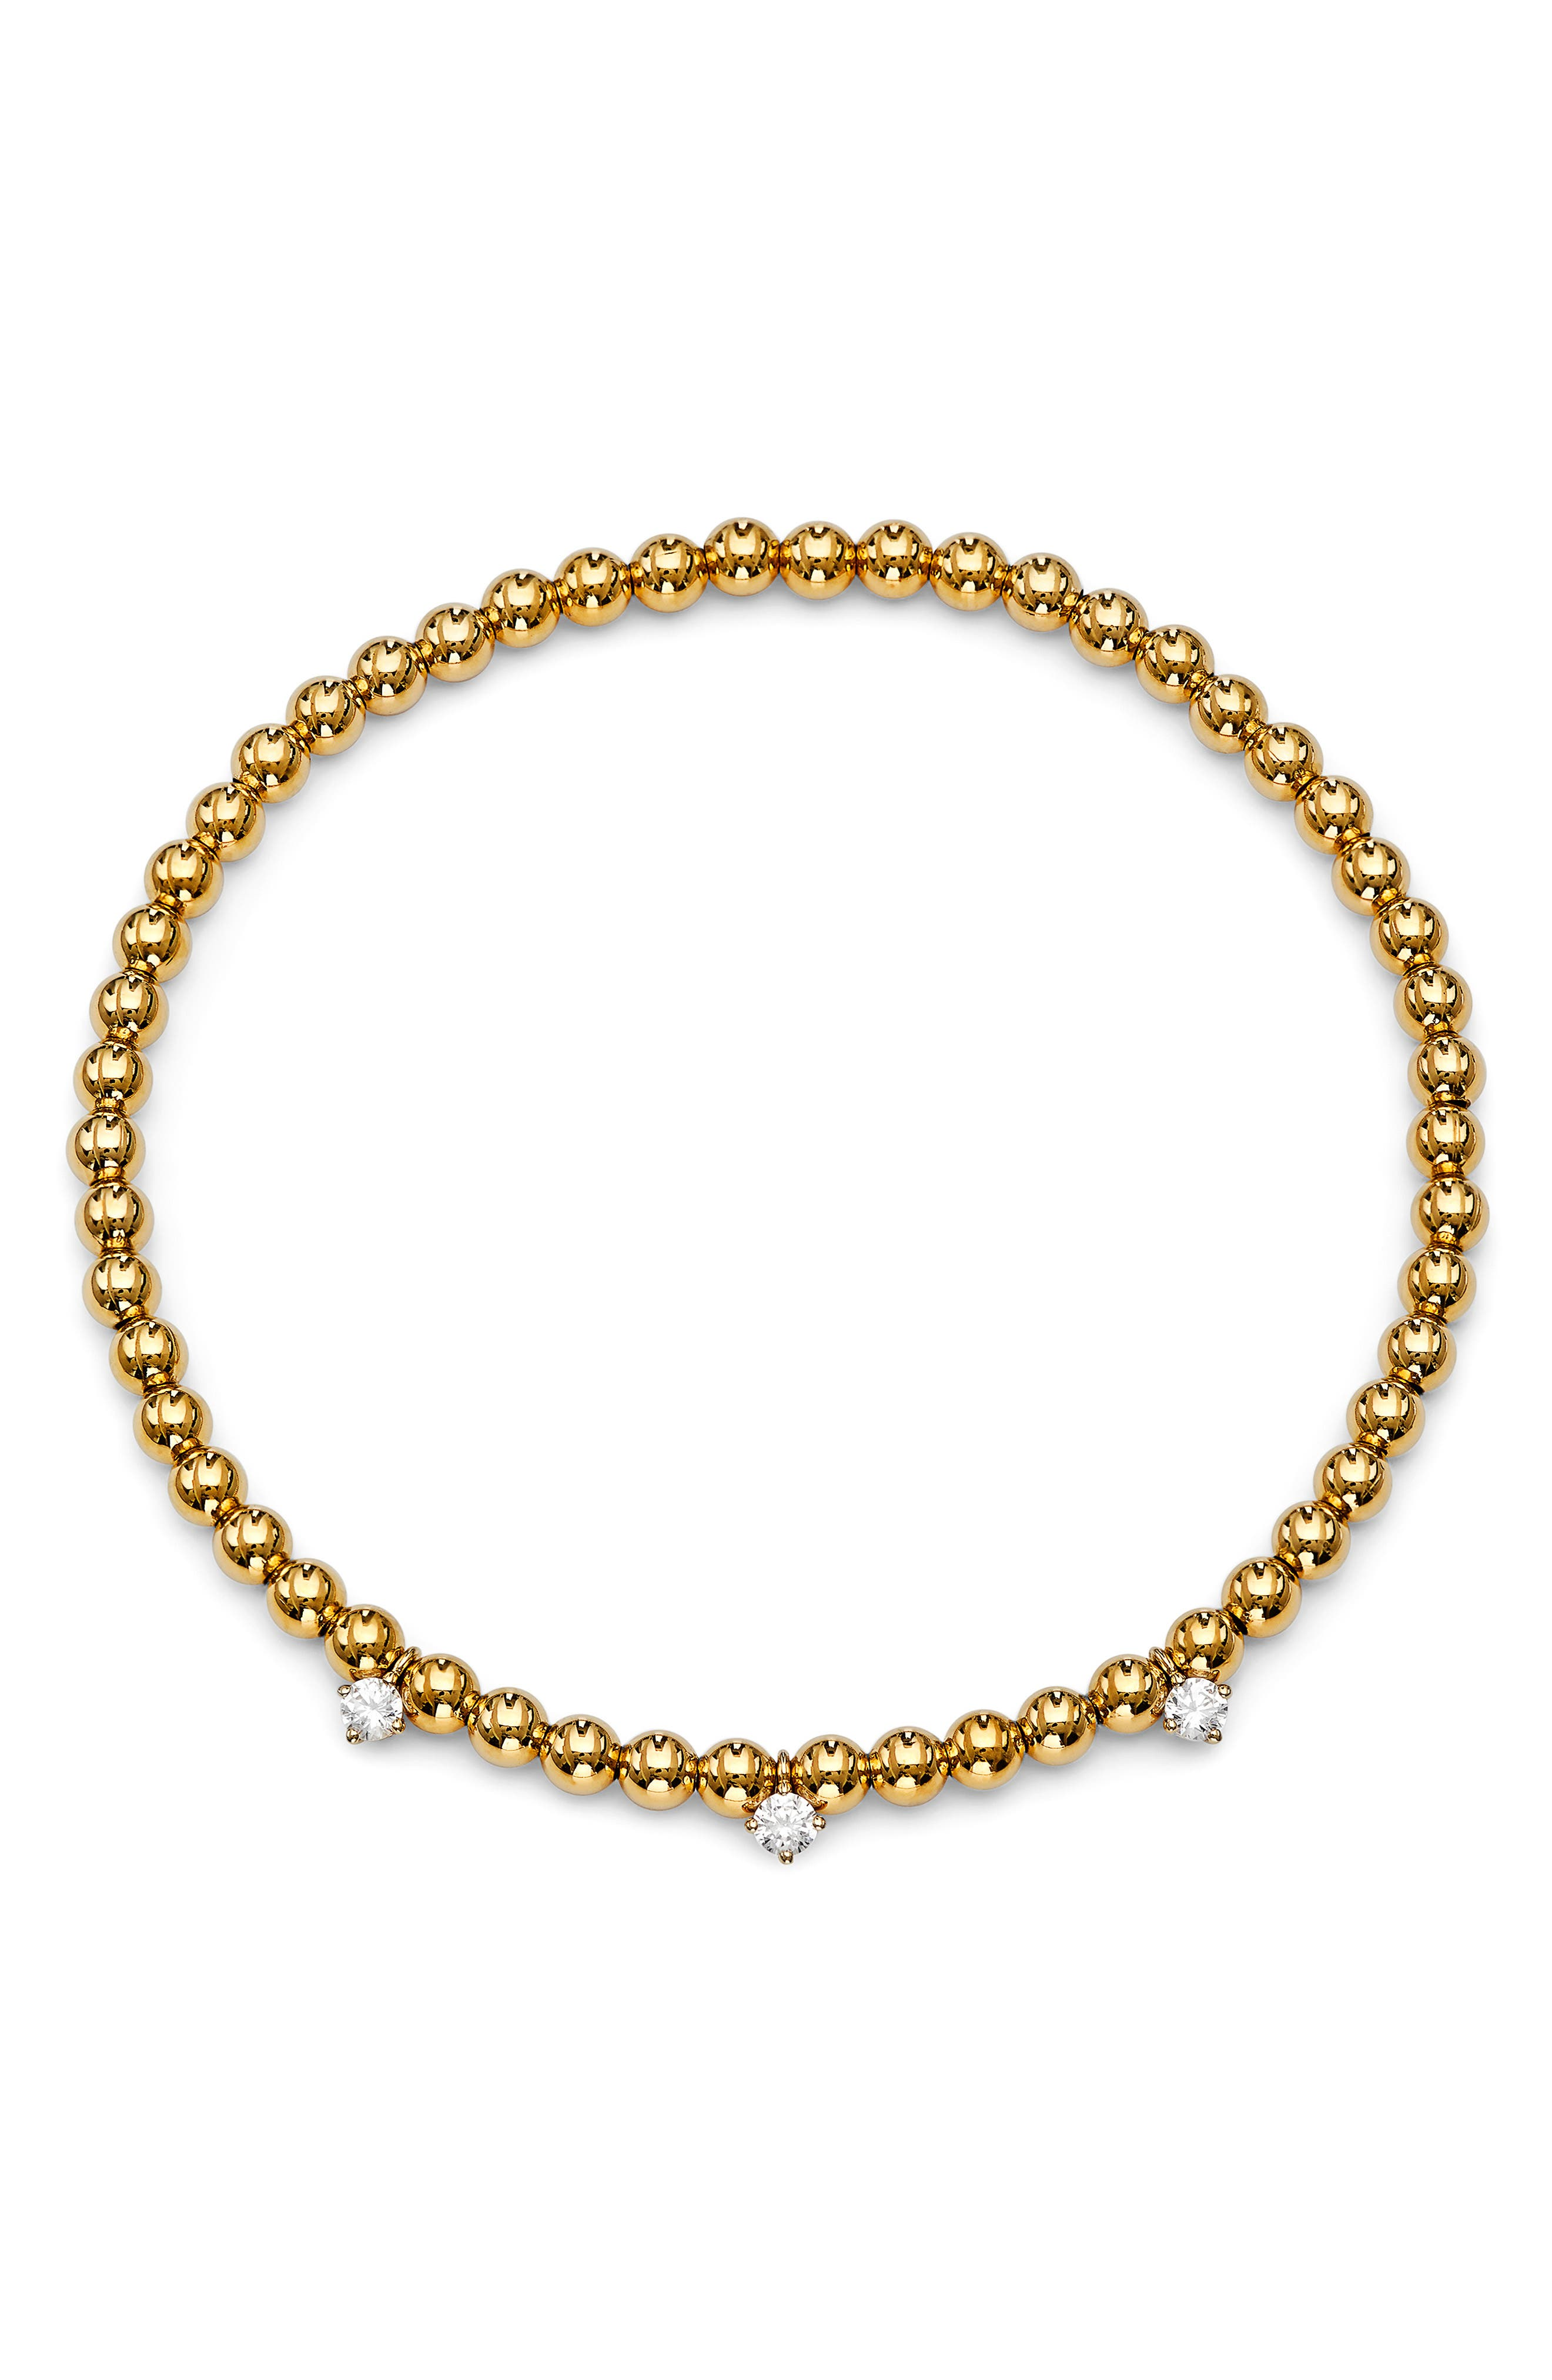 Image of AJOA Lala Cubic Zirconia Stretch Bracelet